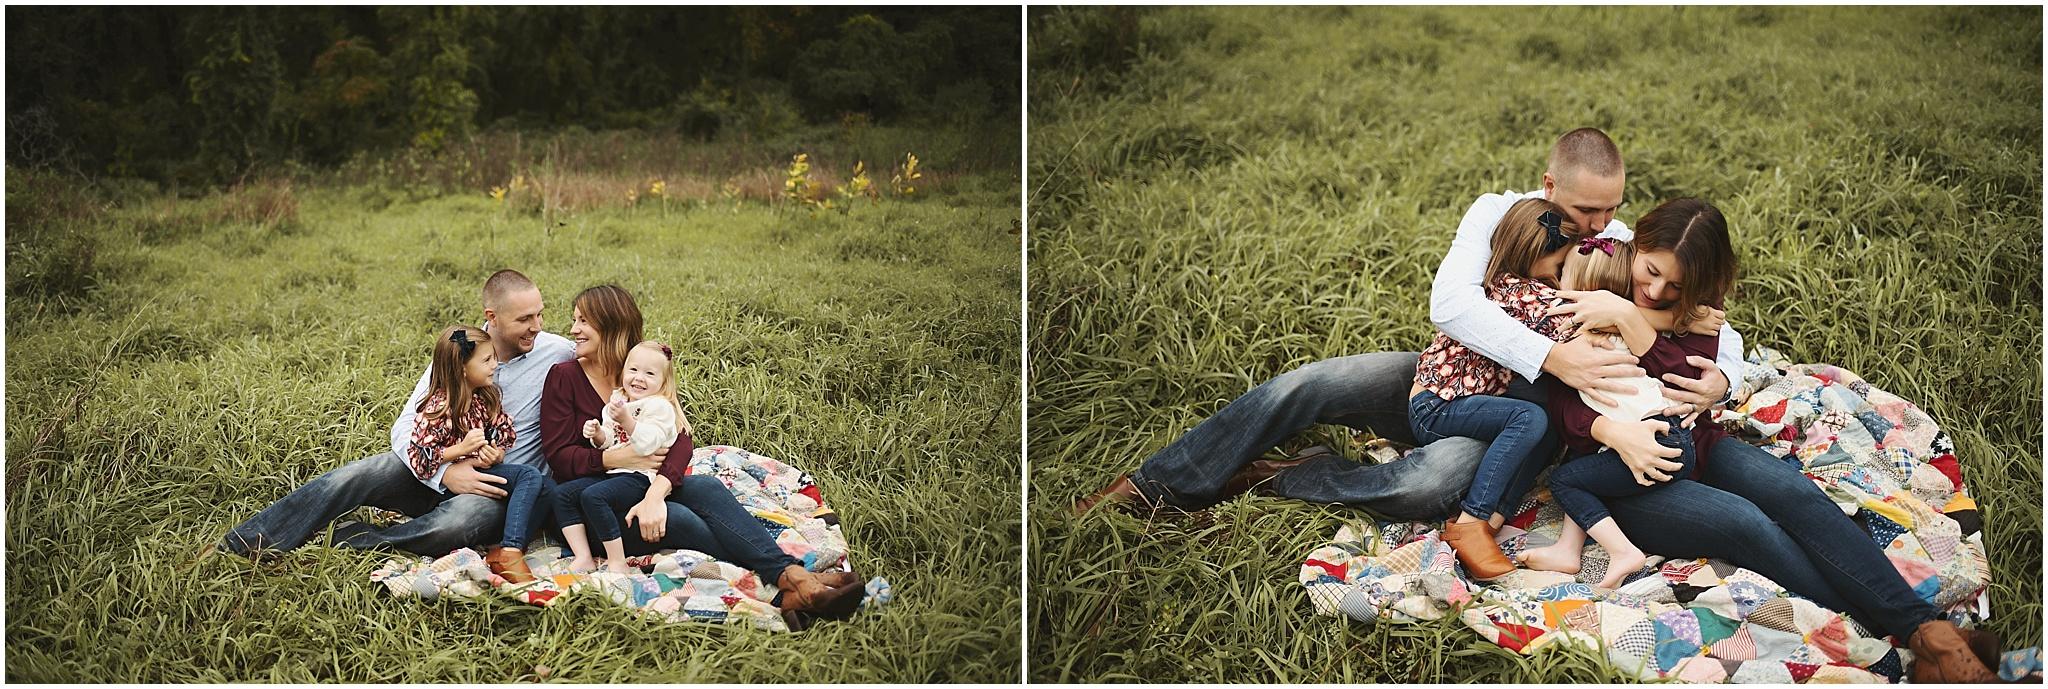 karra lynn photography - family photographer milford mi - family on blanket